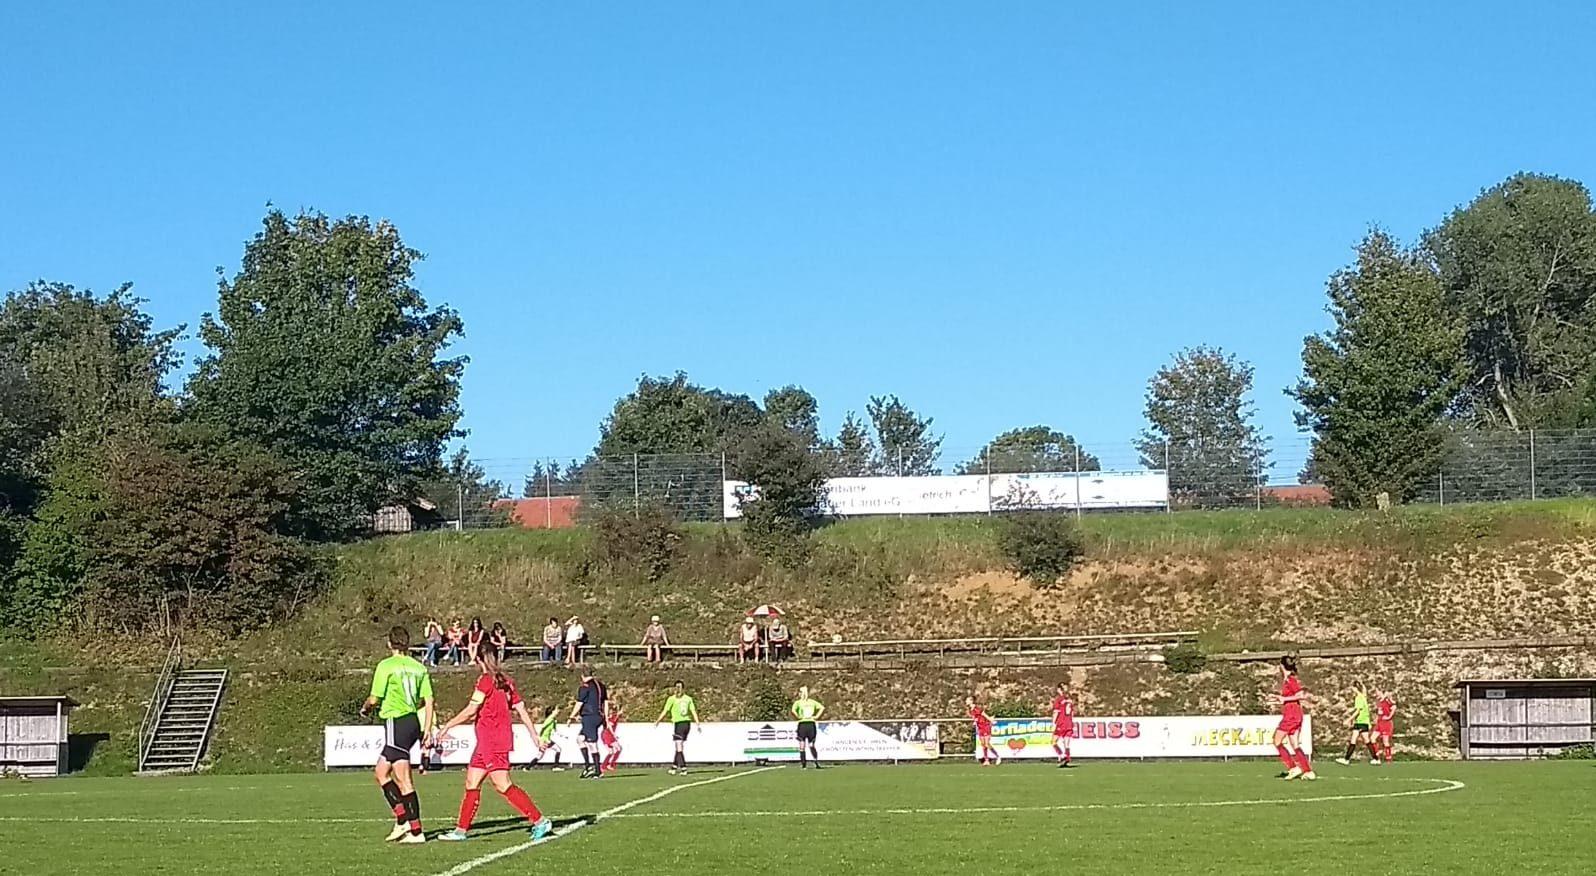 DJK Breitenthal – 1. FC Sonthofen 3:3 (0:1)